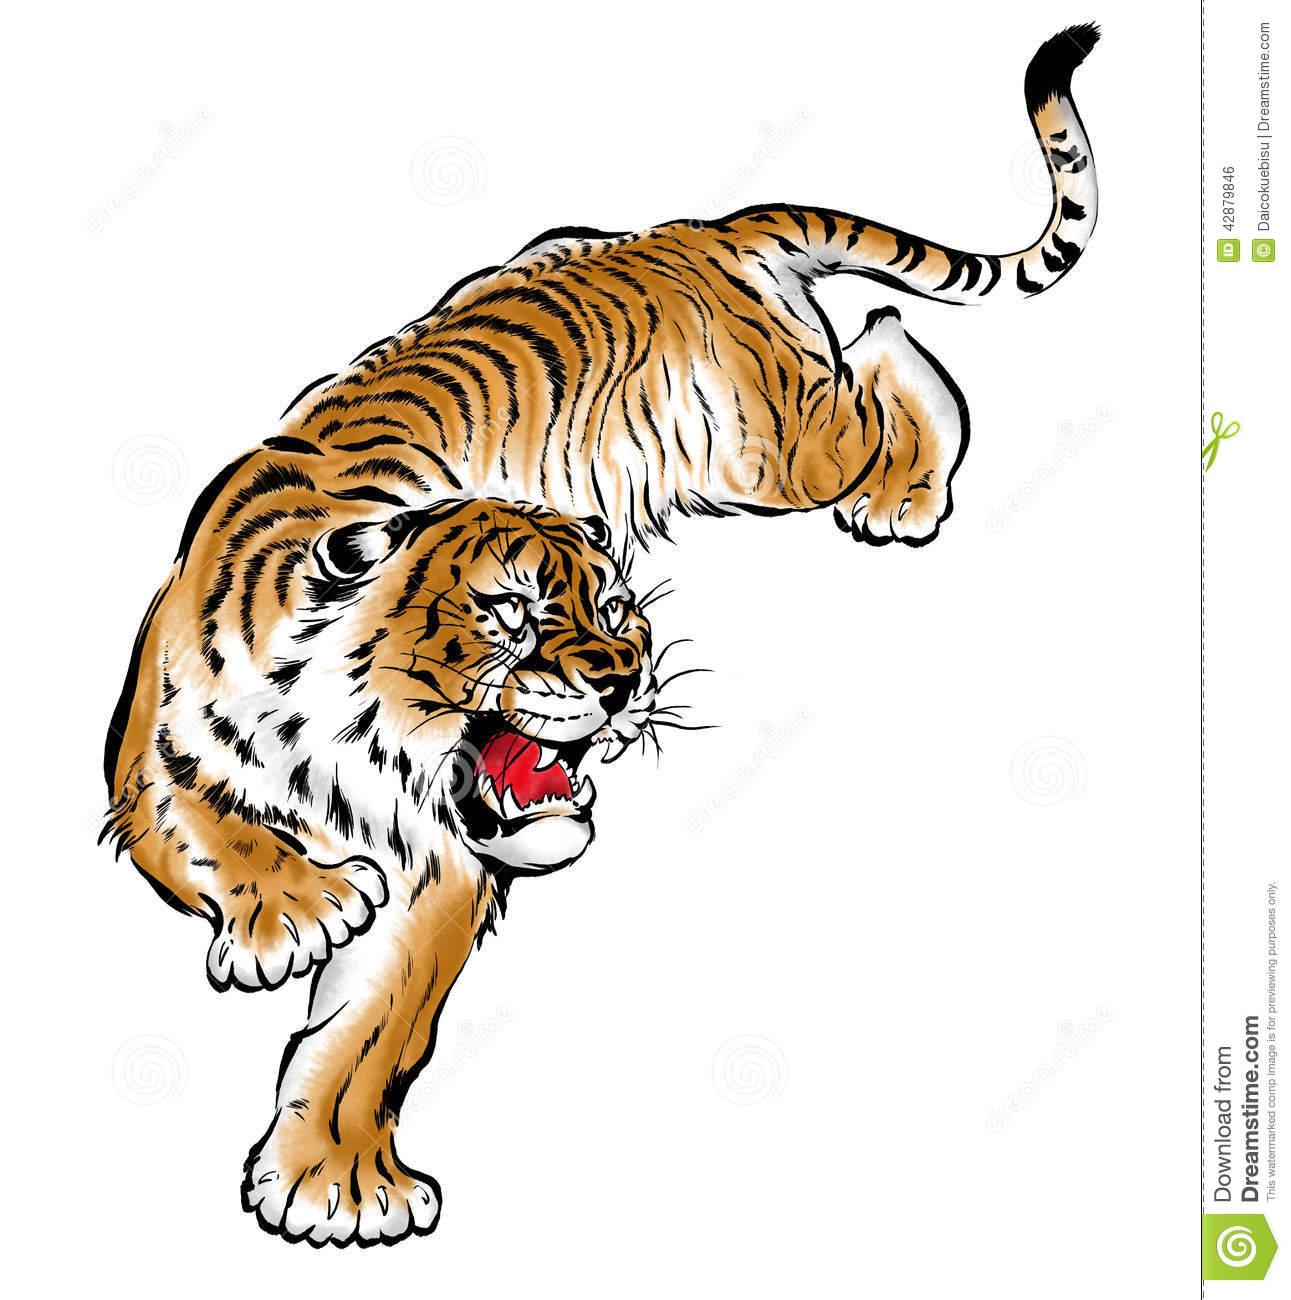 Japanese tiger stock illustration. Illustration of material.